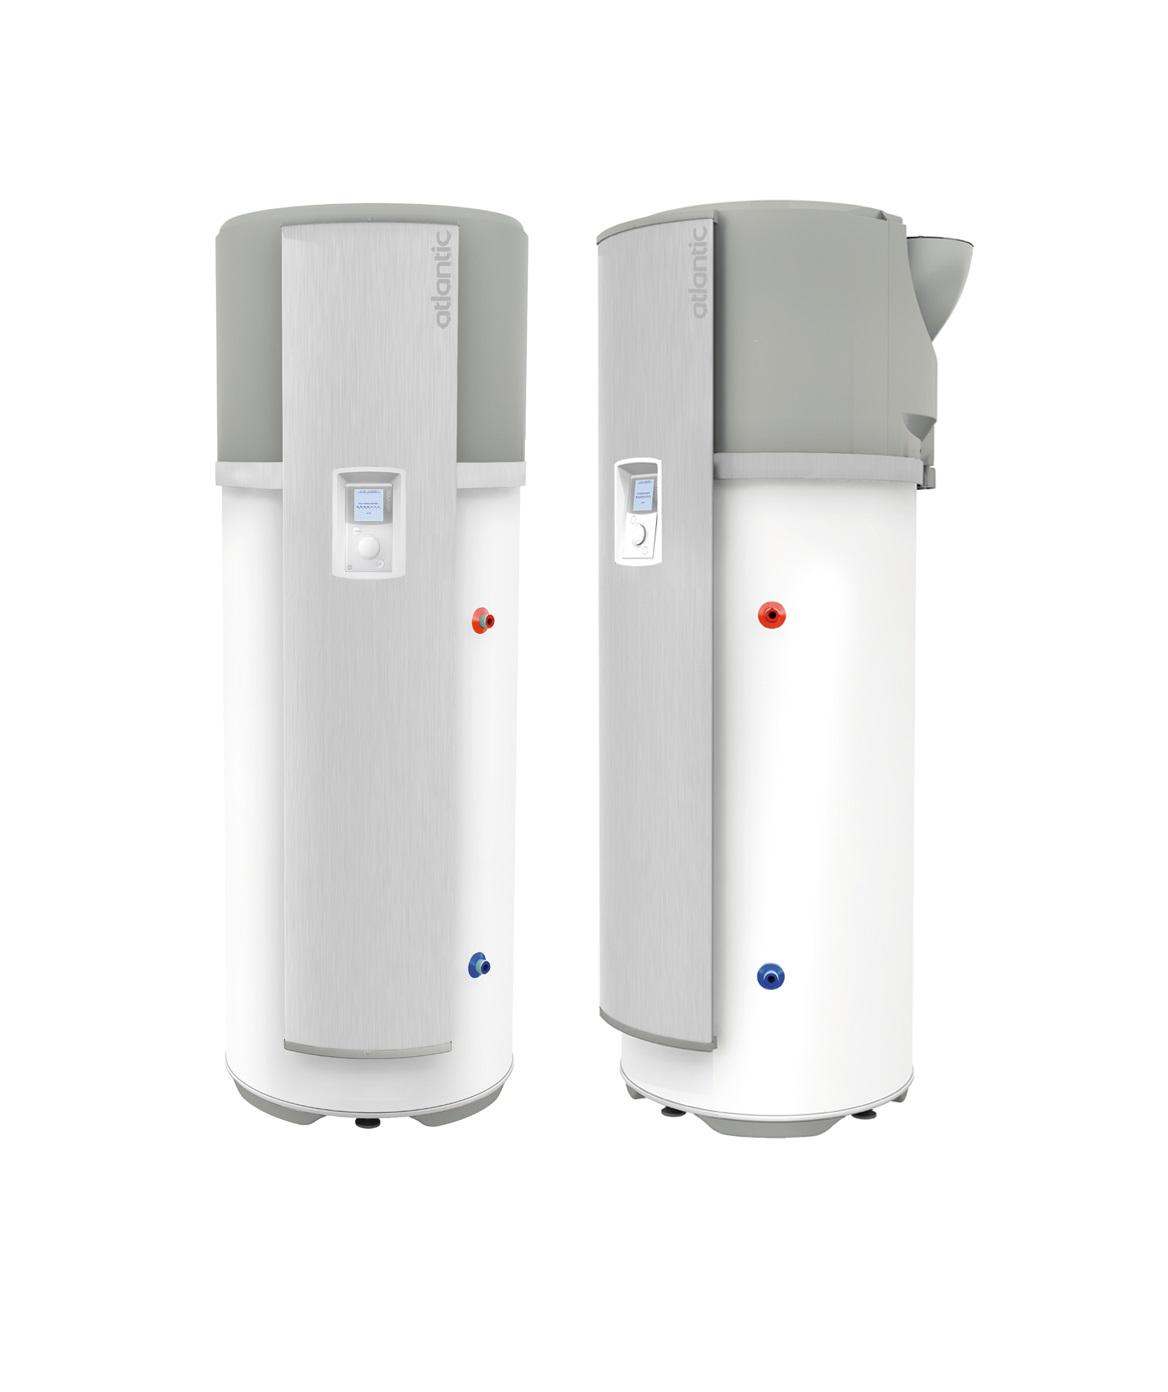 Credit Impot Chauffage Reversible climatic installation climatisation réversible ou chauffage